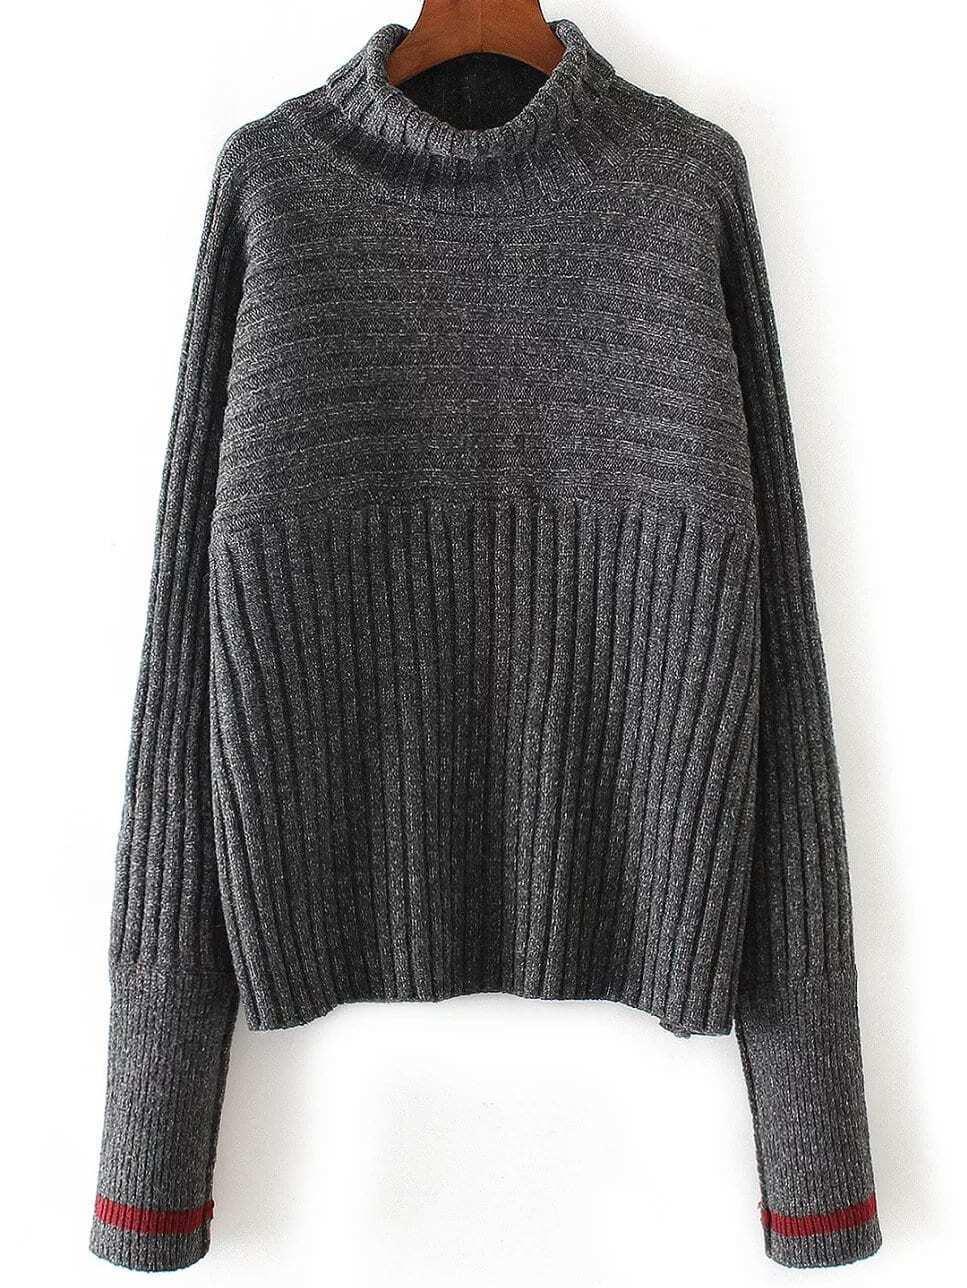 Dark Grey Turtleneck Contrast Cuff Ribbed Sweater sweater161014201